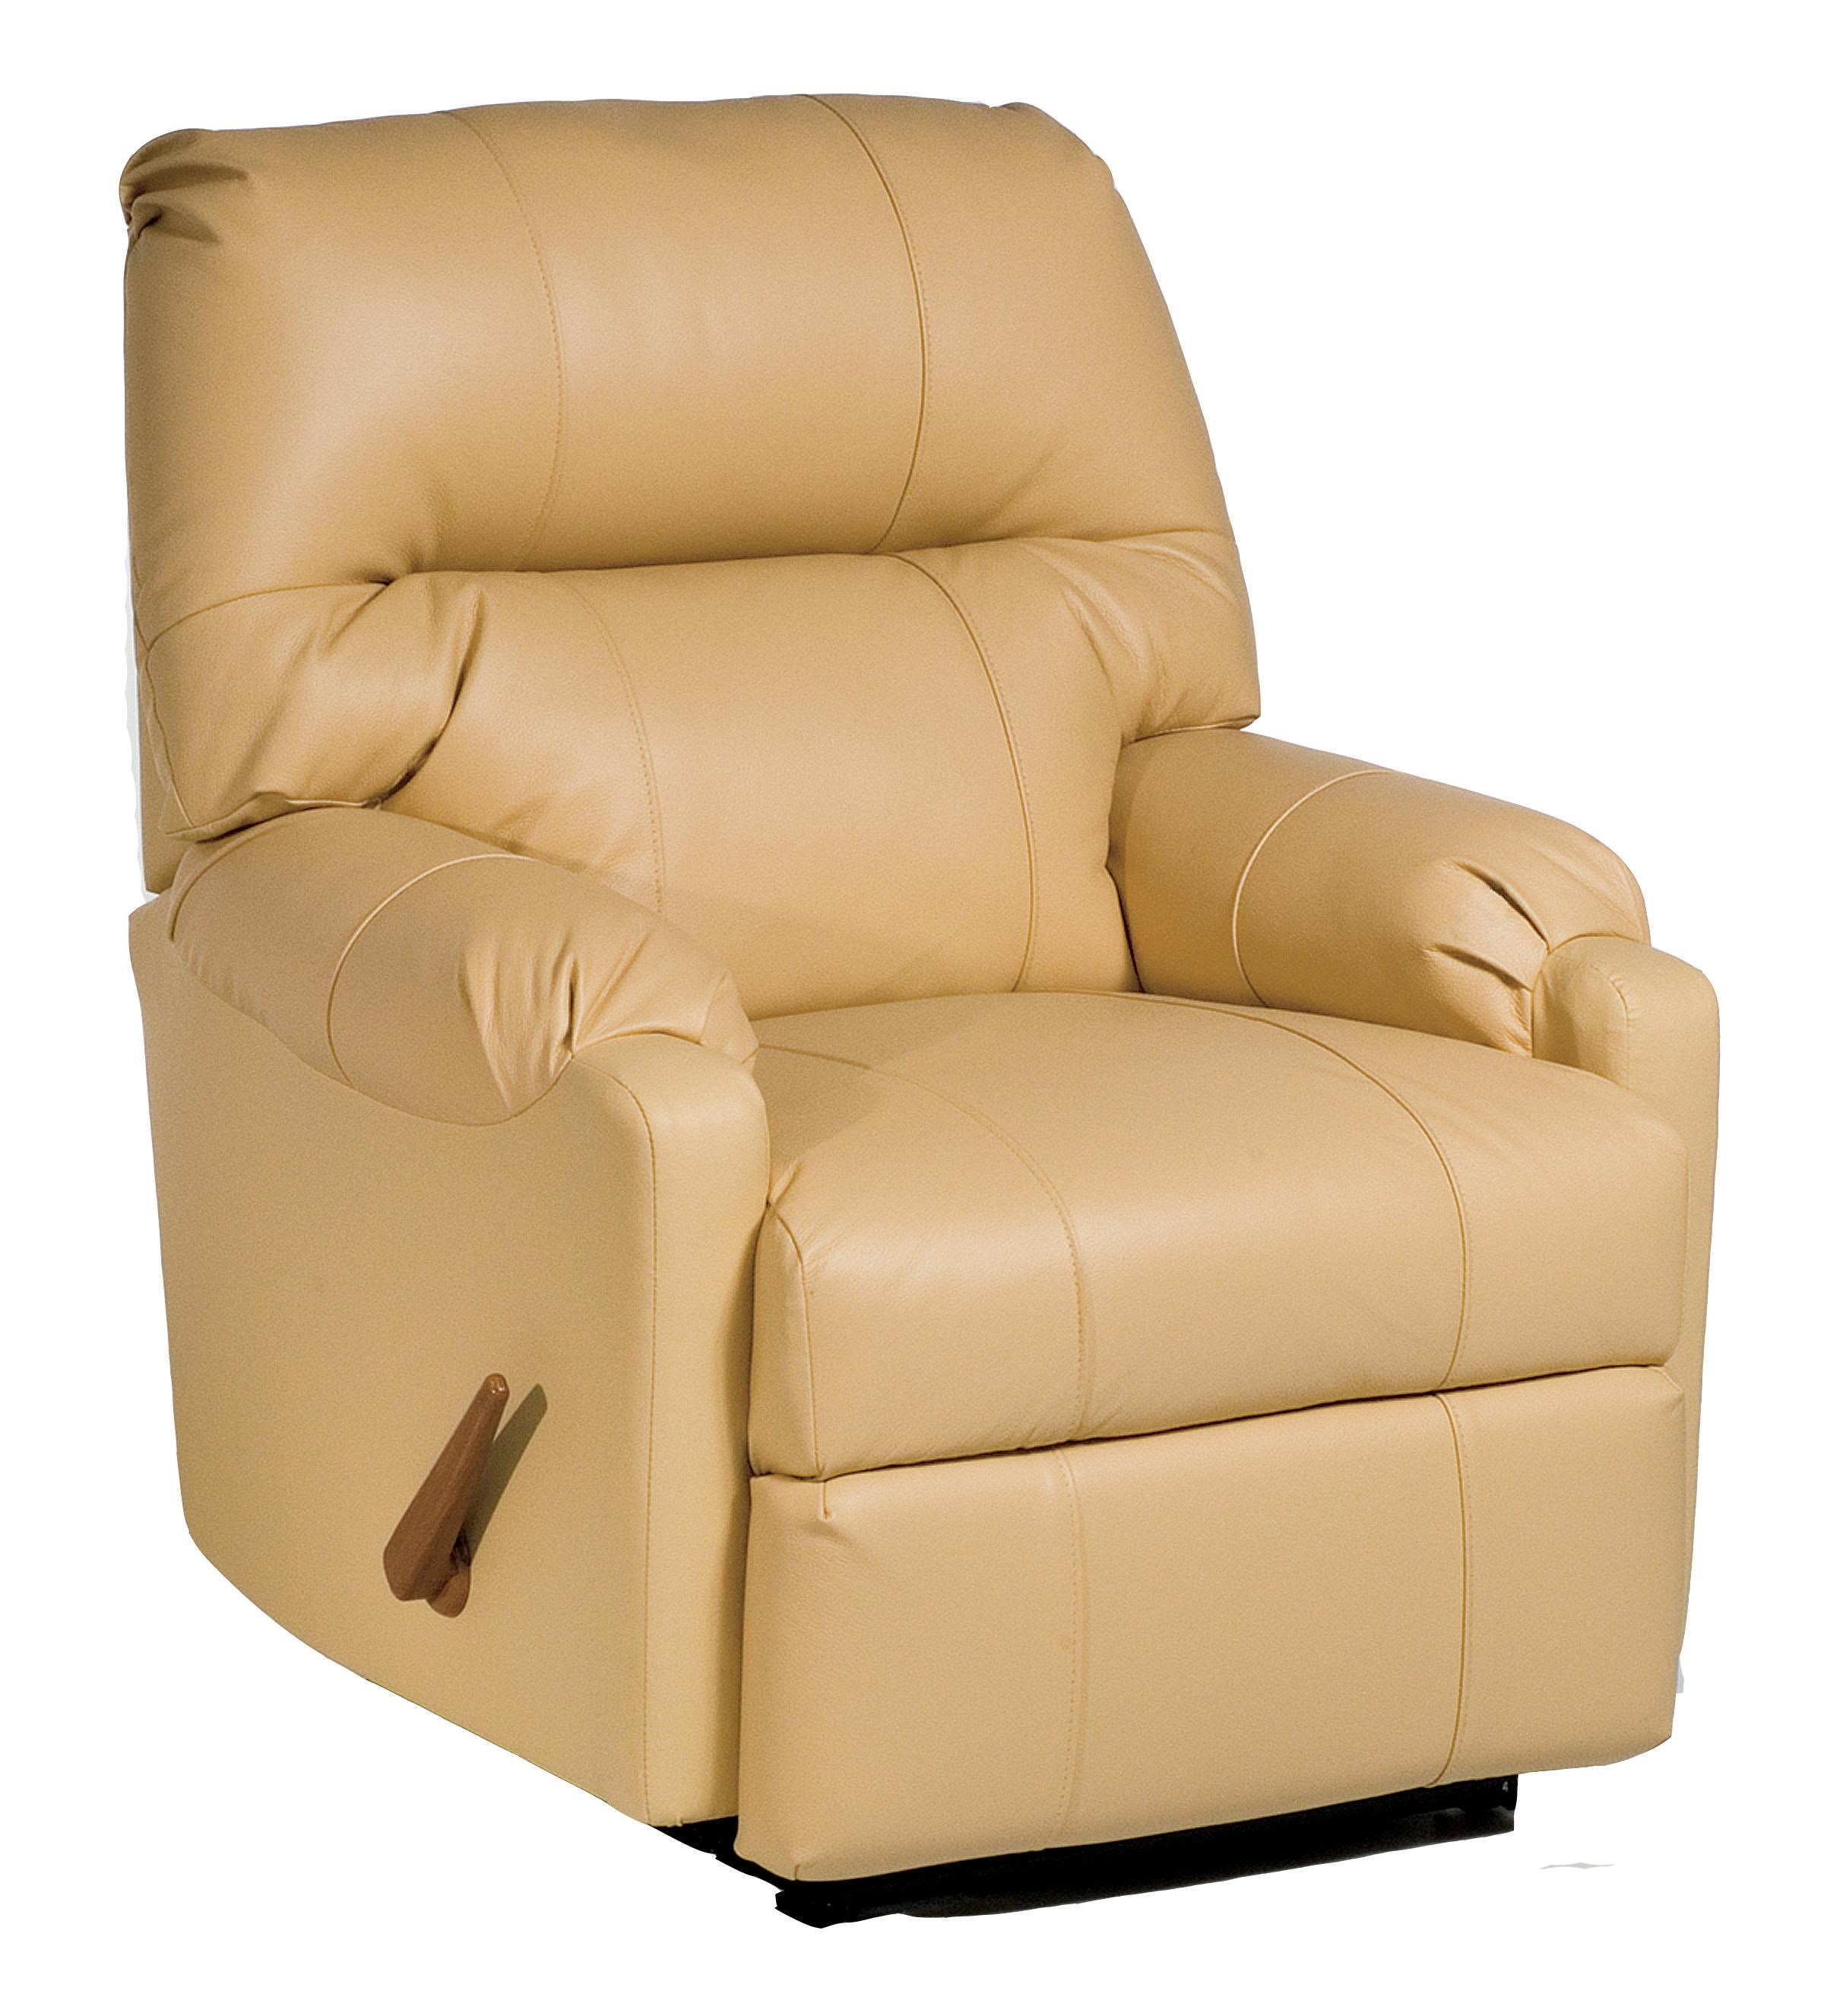 Best Home Furnishings Recliners   Petite JoJo Recliner   Hudsonu0027s Furniture    Three Way Recliners